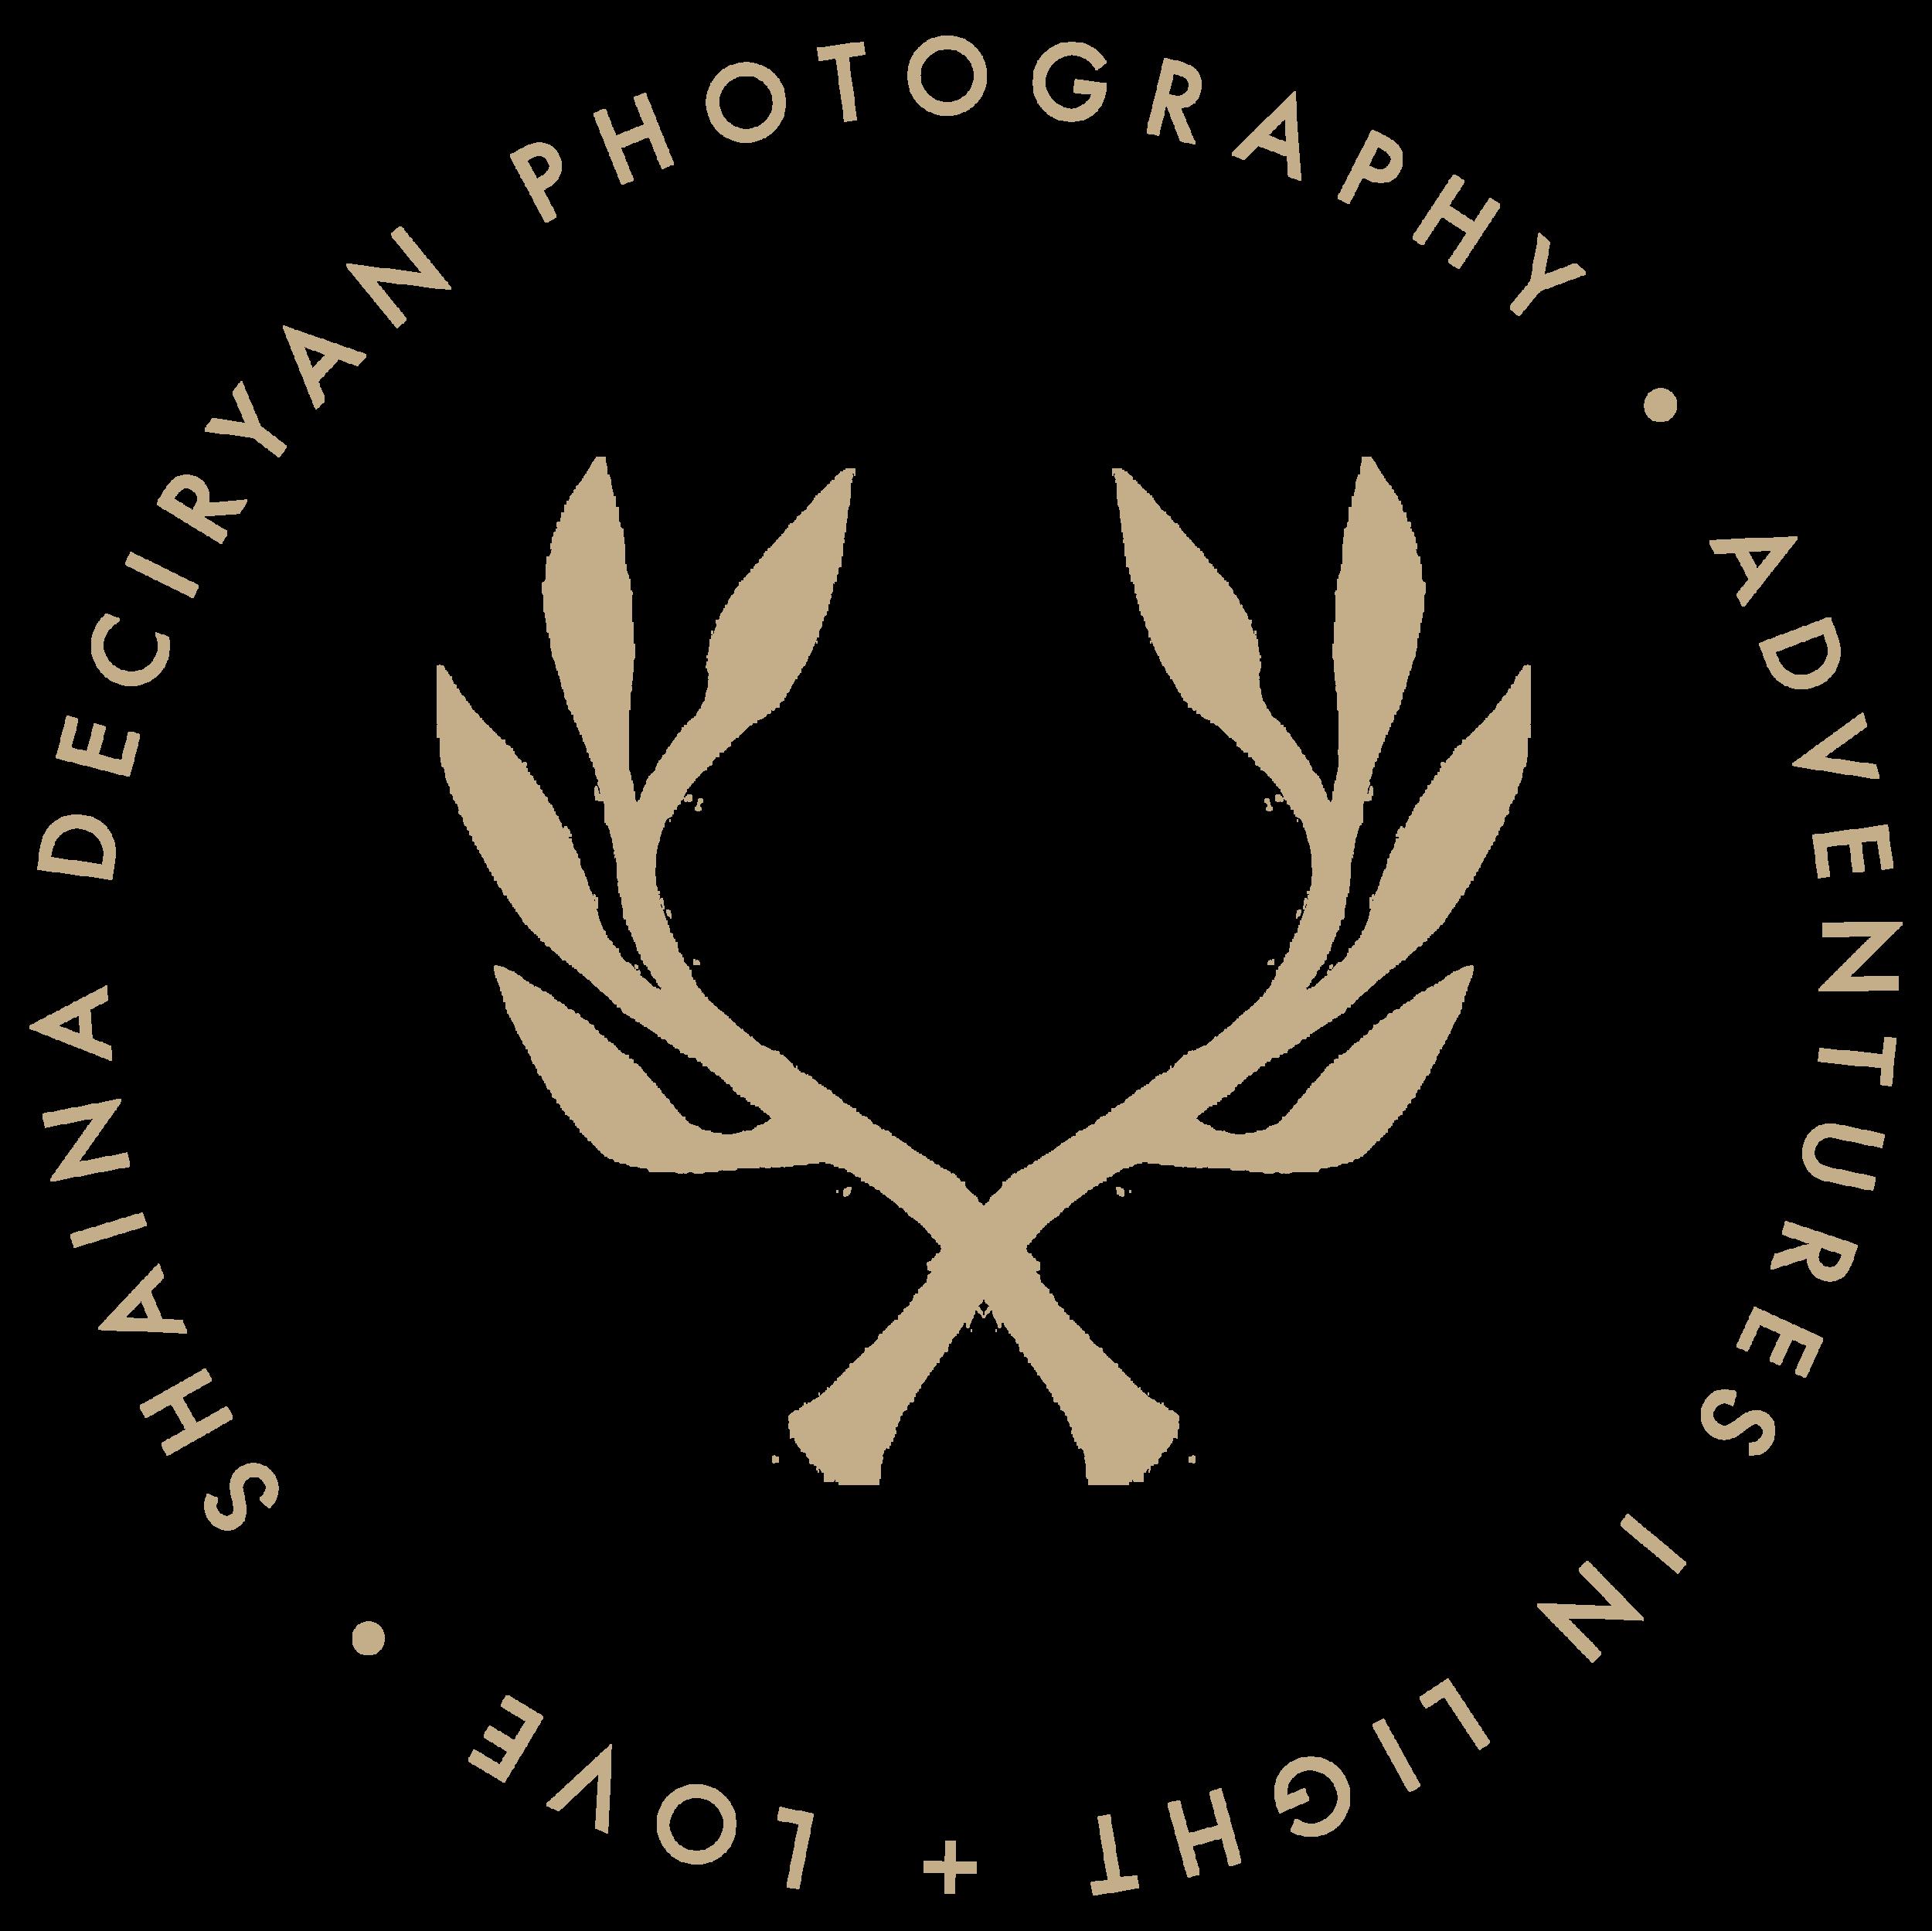 Seattle Adventure Elopement + Intimate Wedding Photographer Logo - Shaina DeCiryan